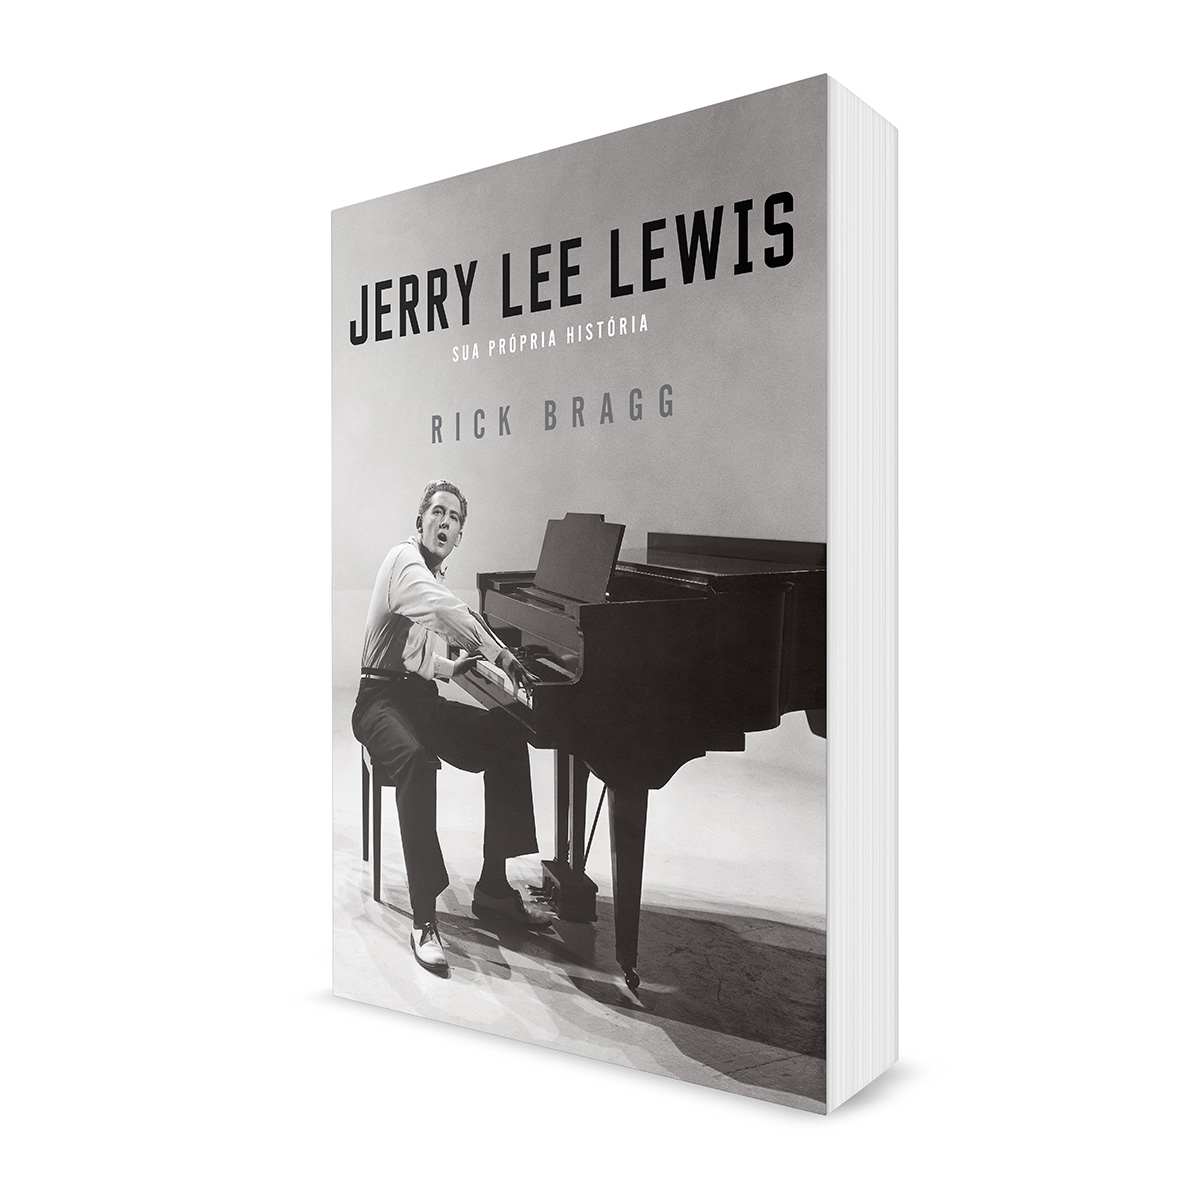 Livro Jerry Lee Lewis: Sua Pr�pria Hist�ria